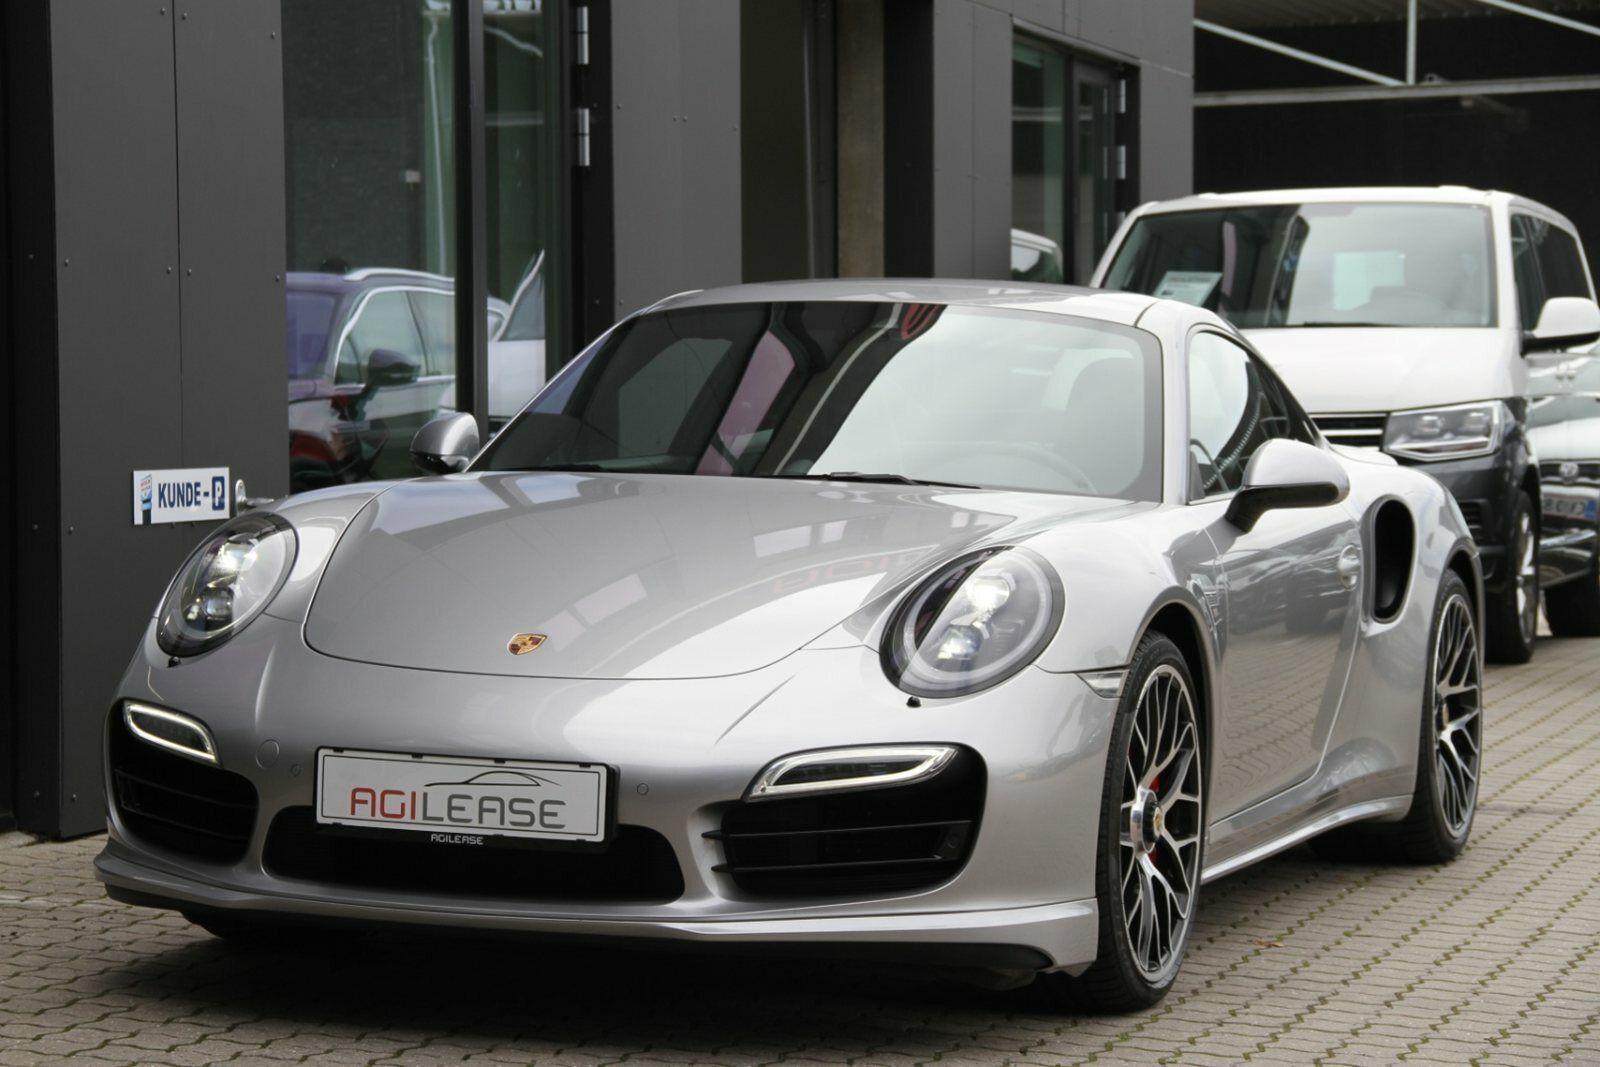 Porsche 911 Turbo 3,8 Coupé PDK 2d - 5.400 kr.